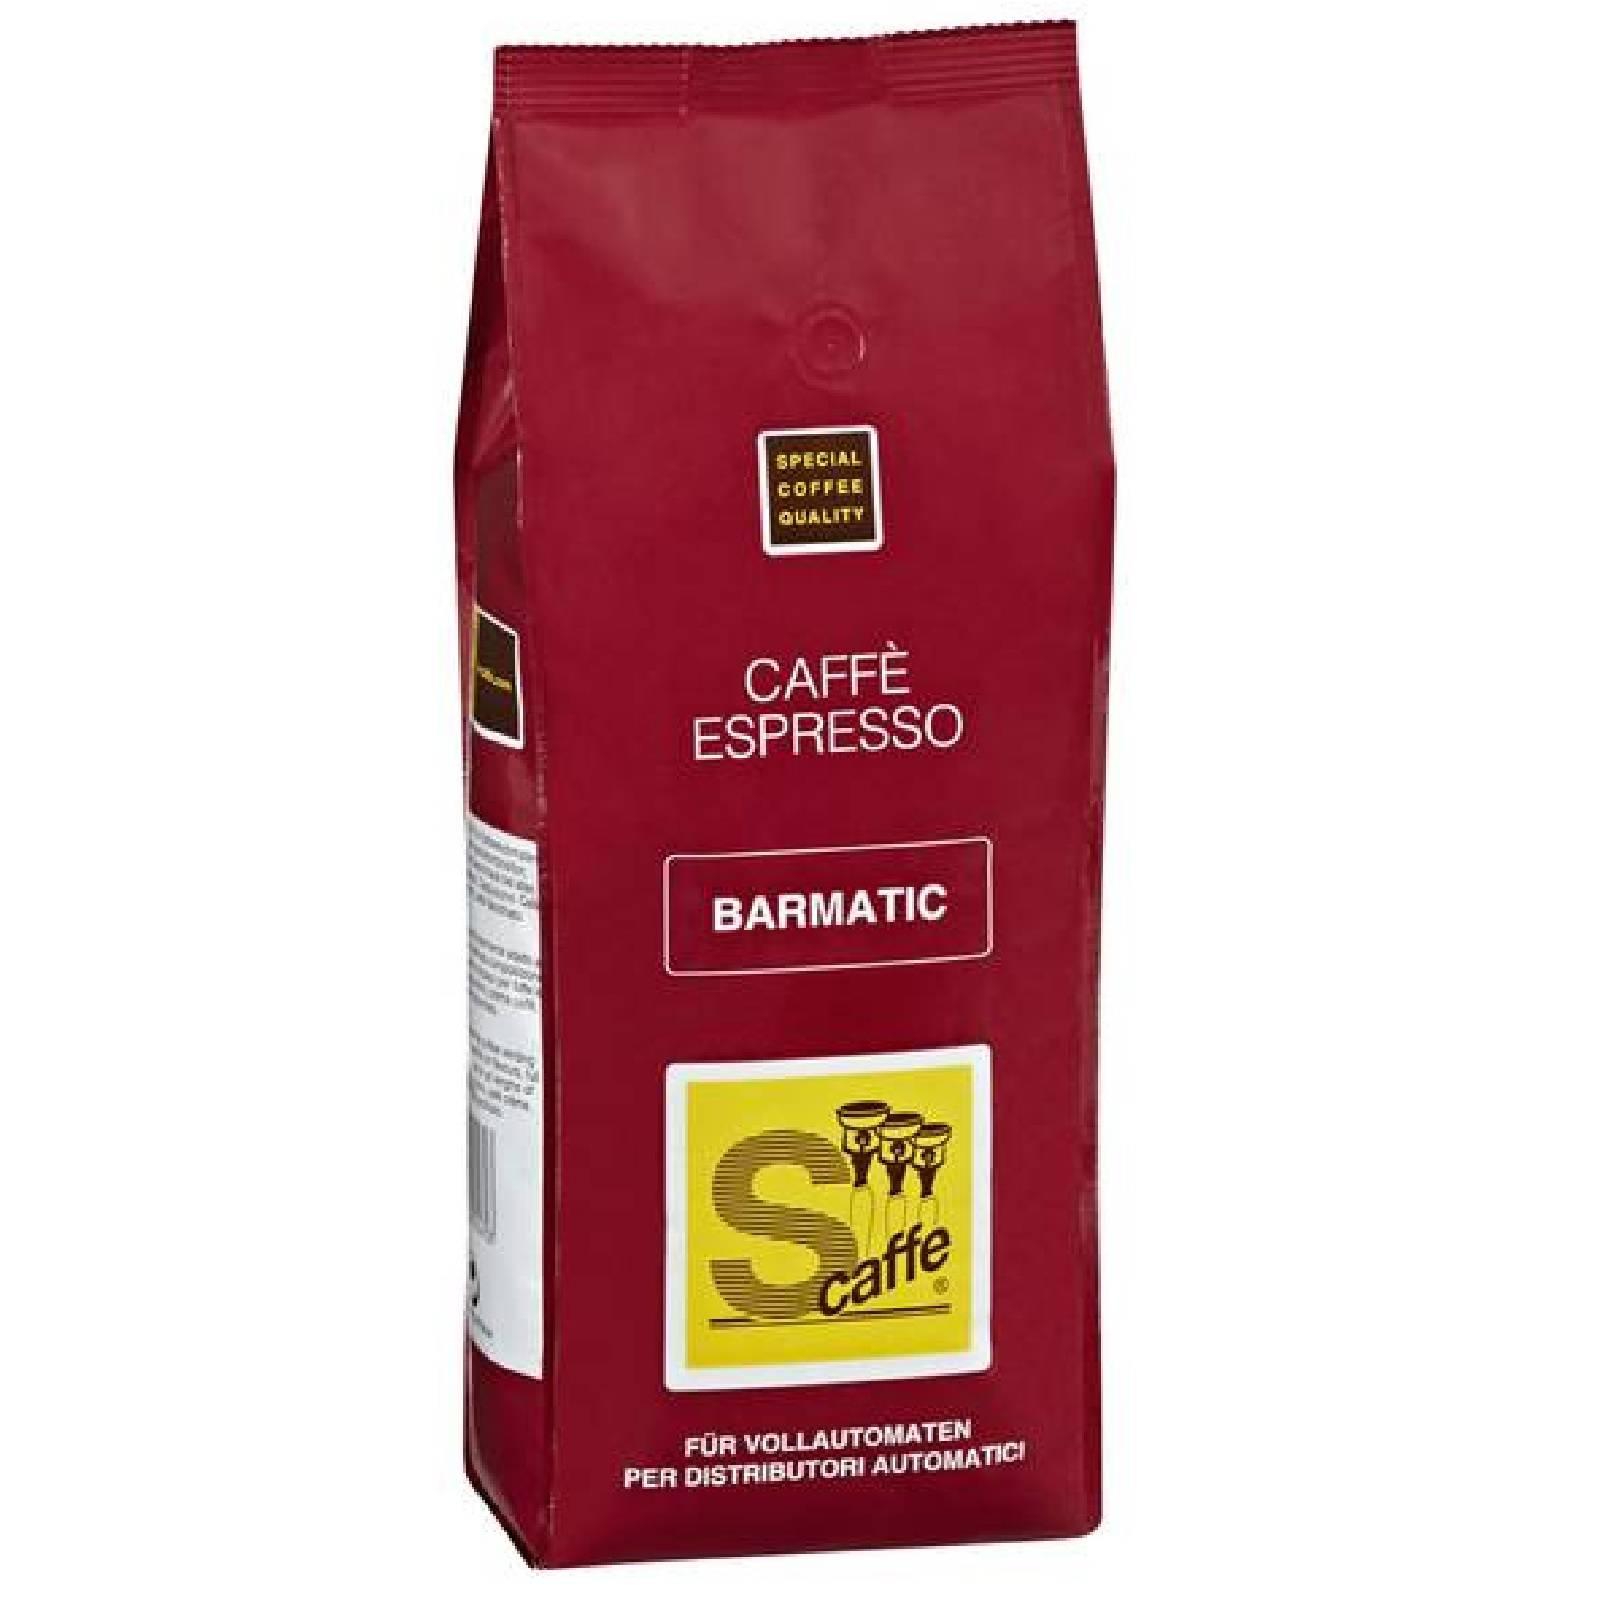 Cafè Espresso Barmatic 1000g Kaffee ganze Bohnen